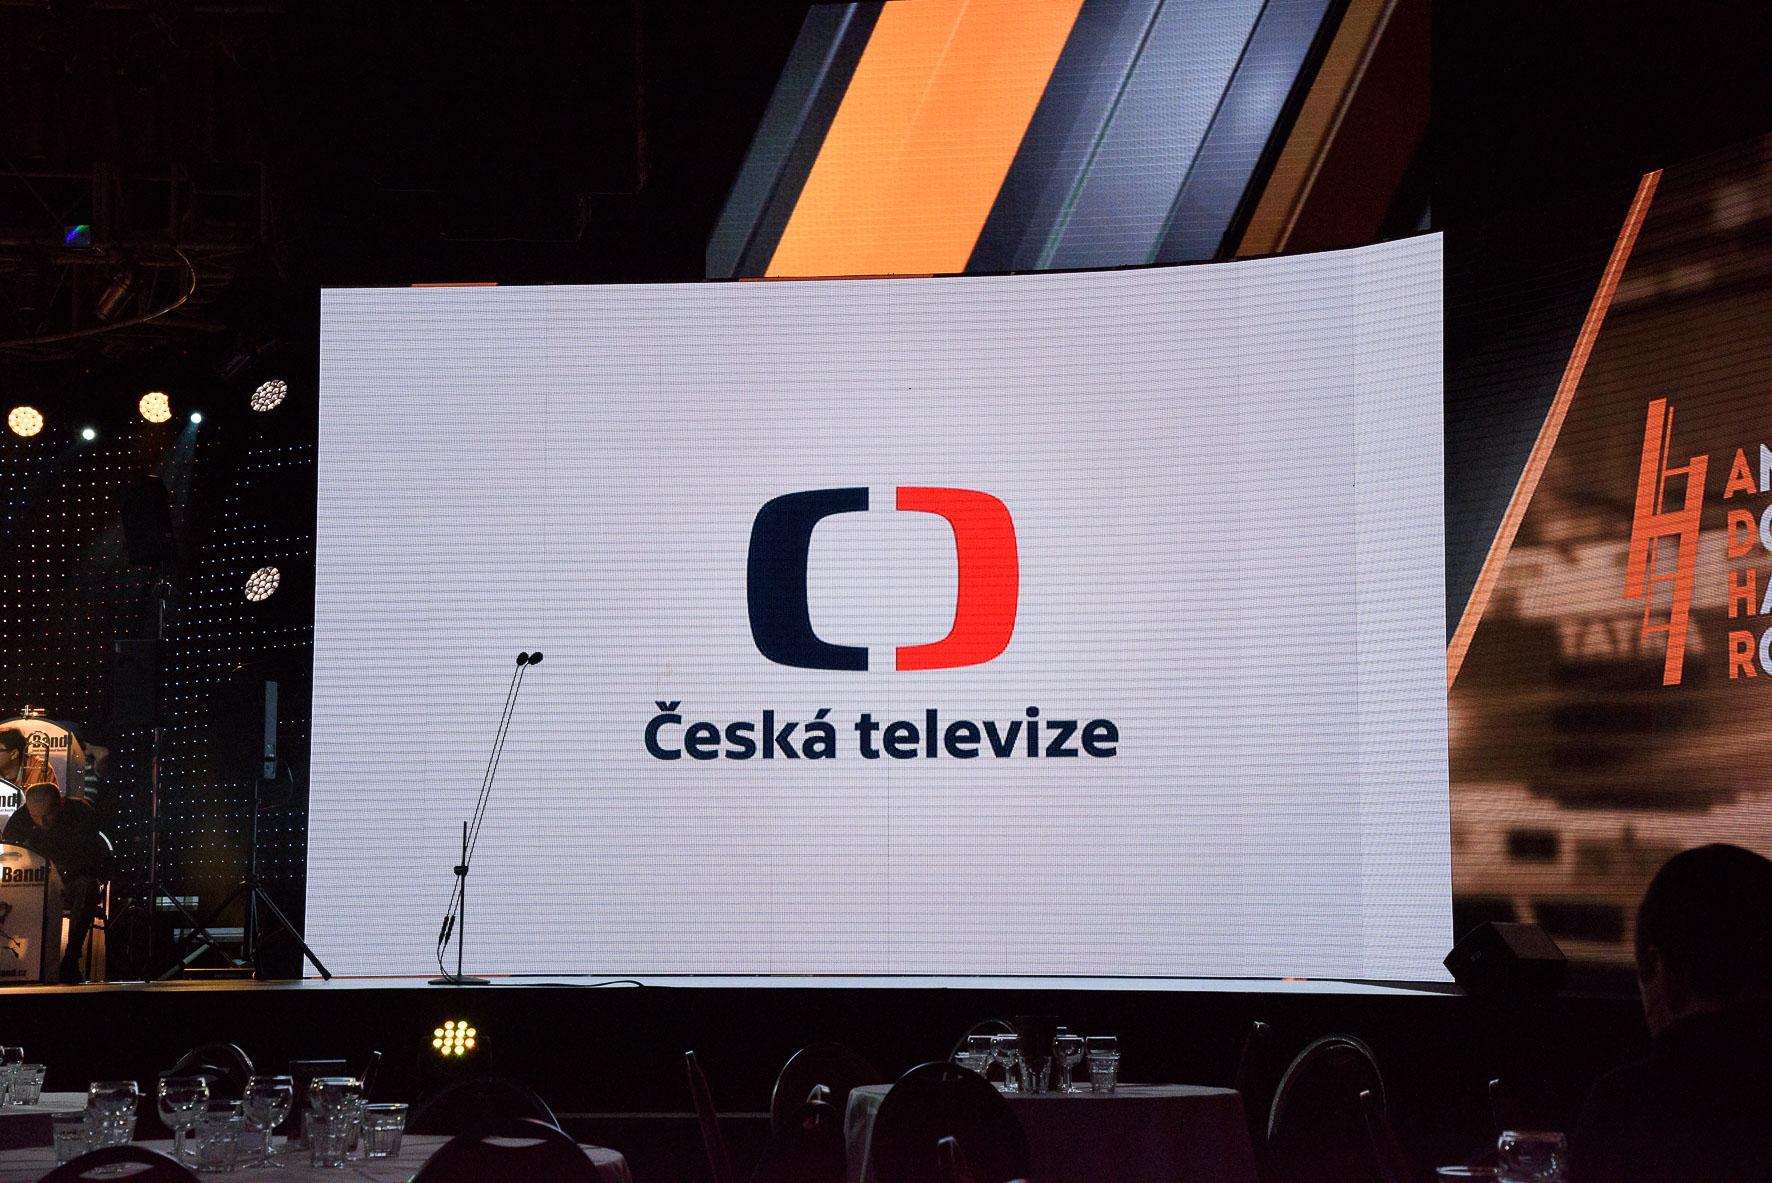 anketa-dobrovolni-hasici-roku-2015-vyhlaseni-vysledku-led-obrazovka-ceska-televize